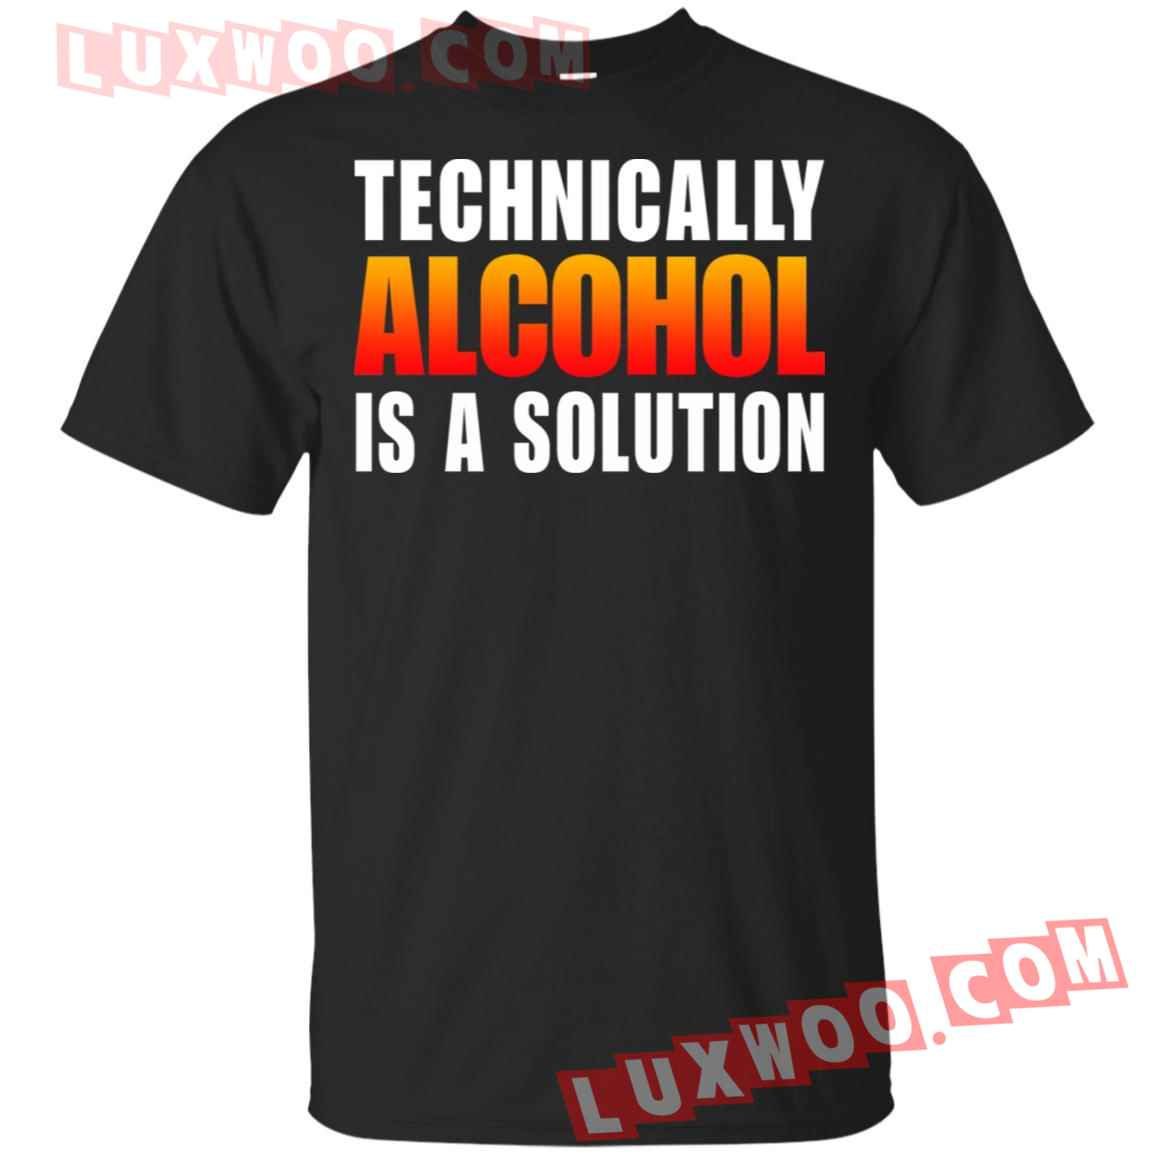 Elon Musk Technically Alcohol Is A Solution Shirt